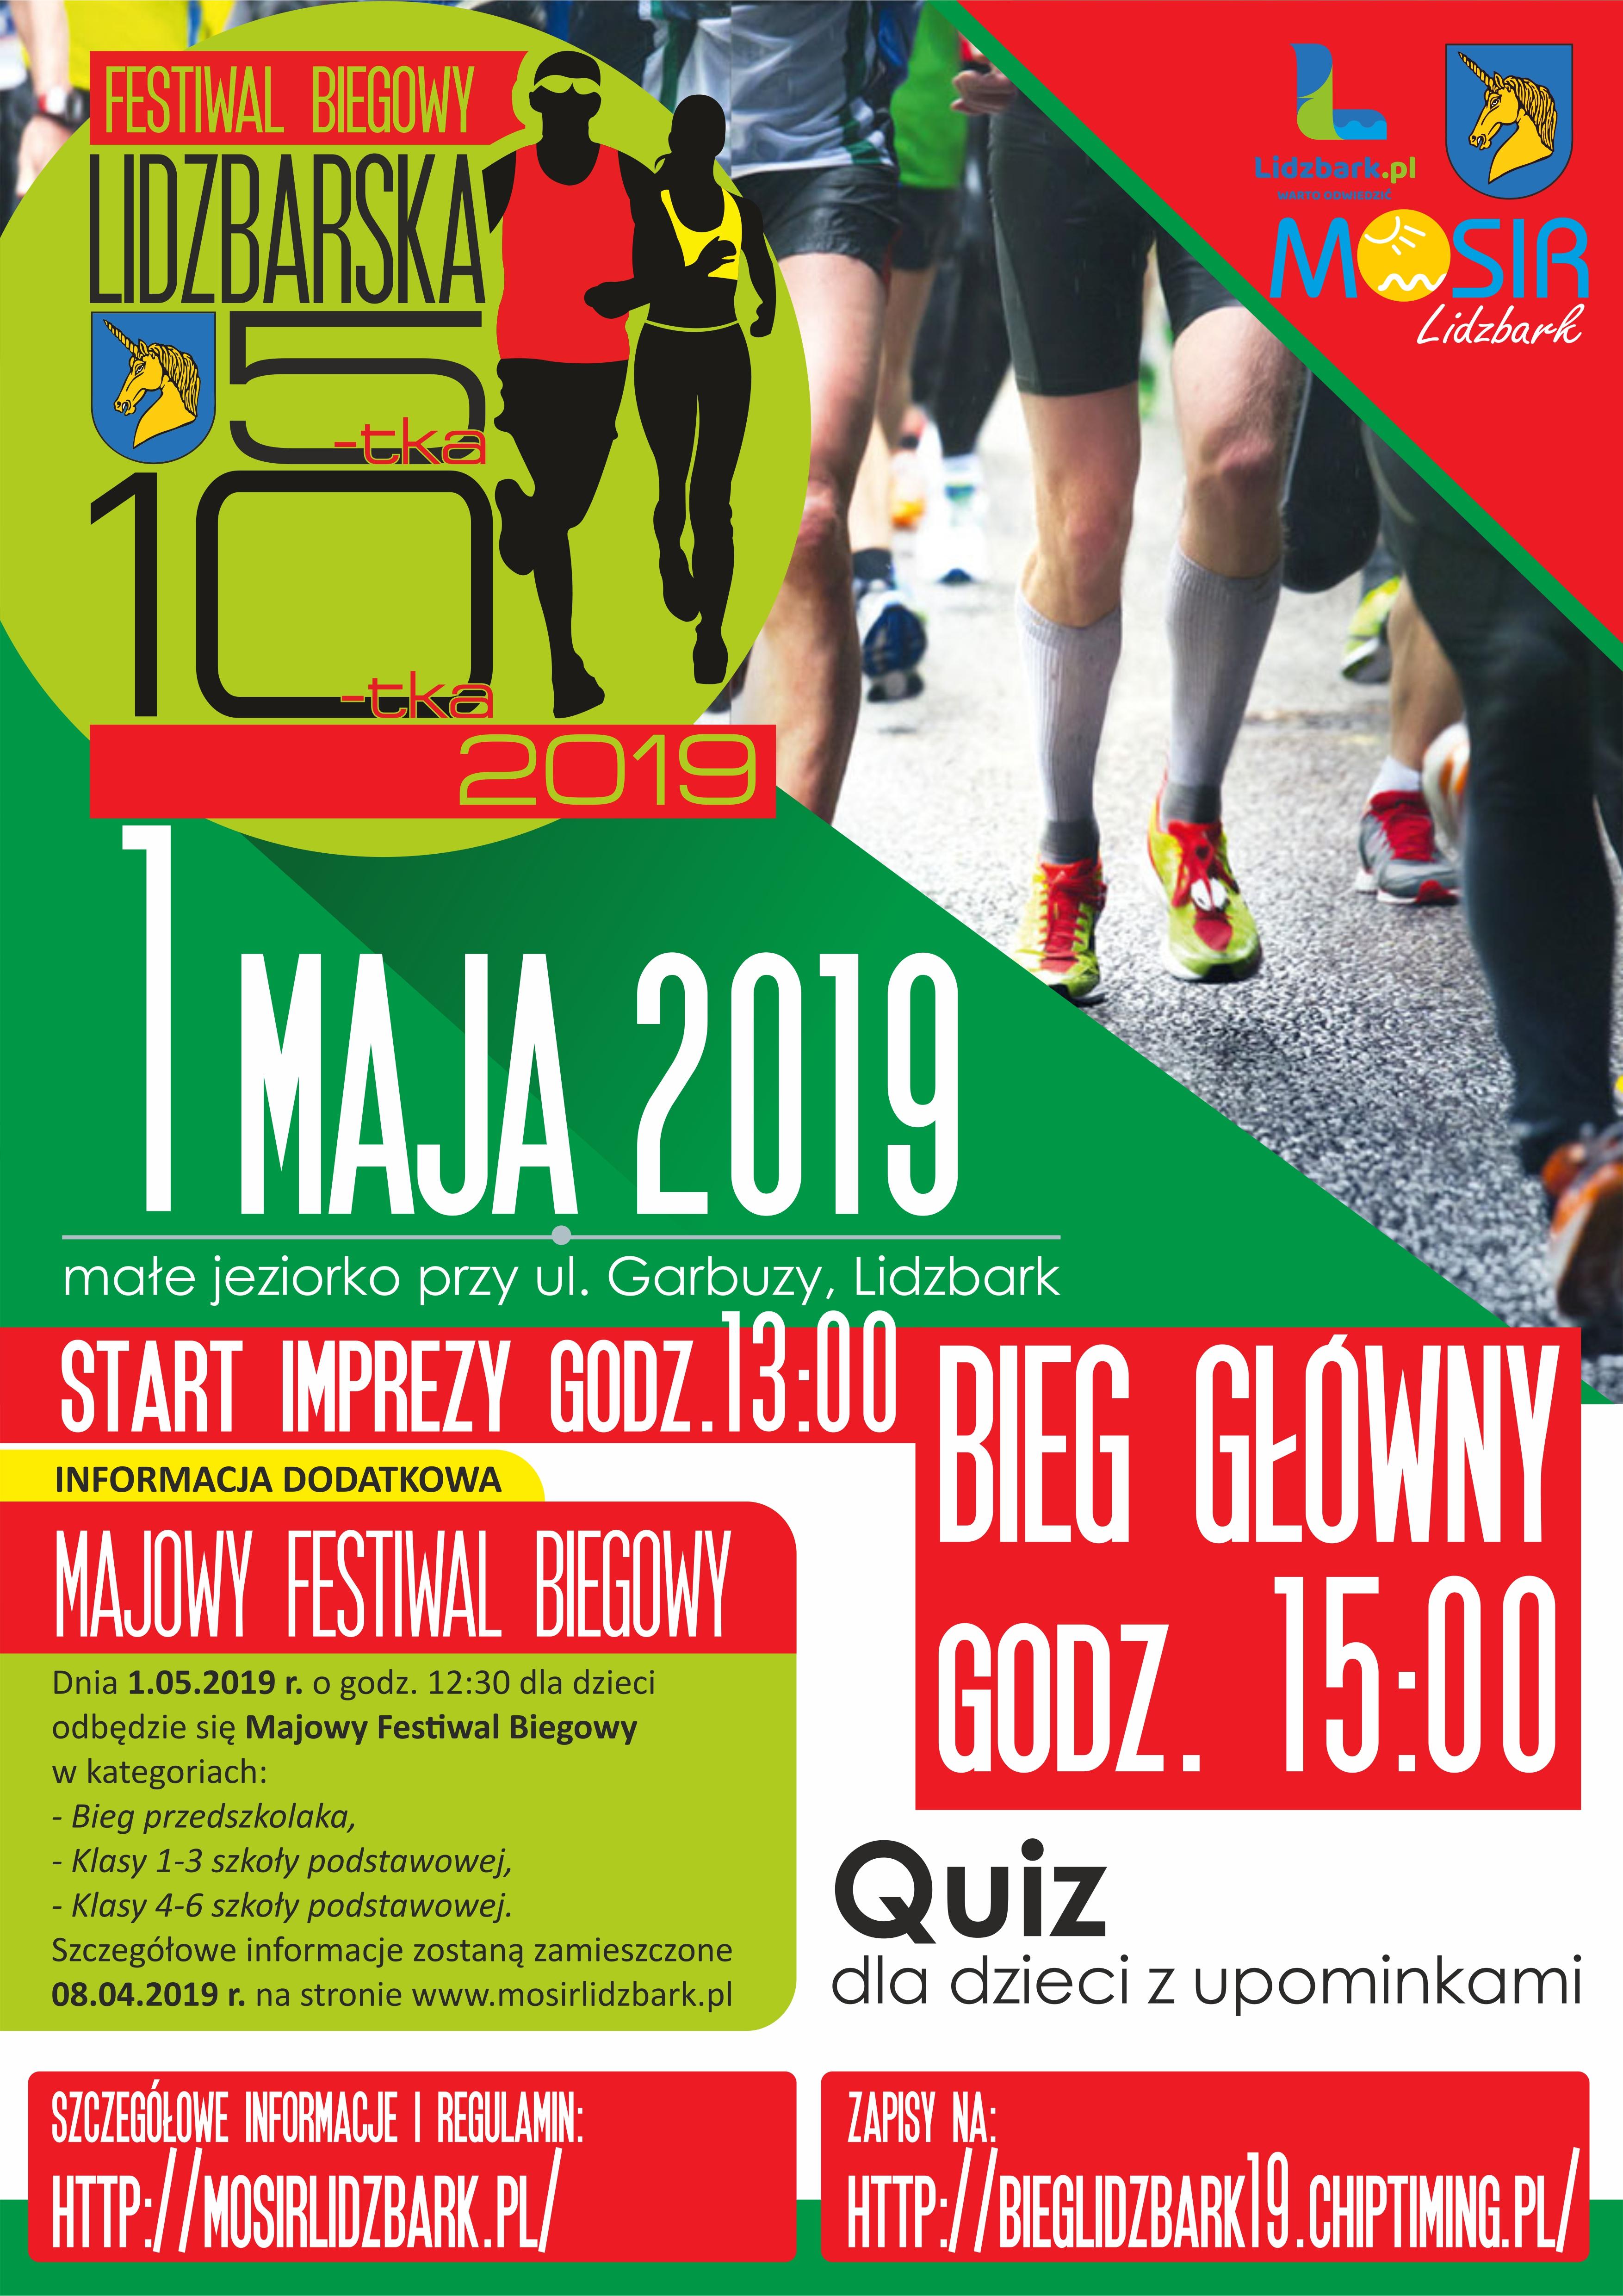 plakat lidzbarska 5 i 10 2019